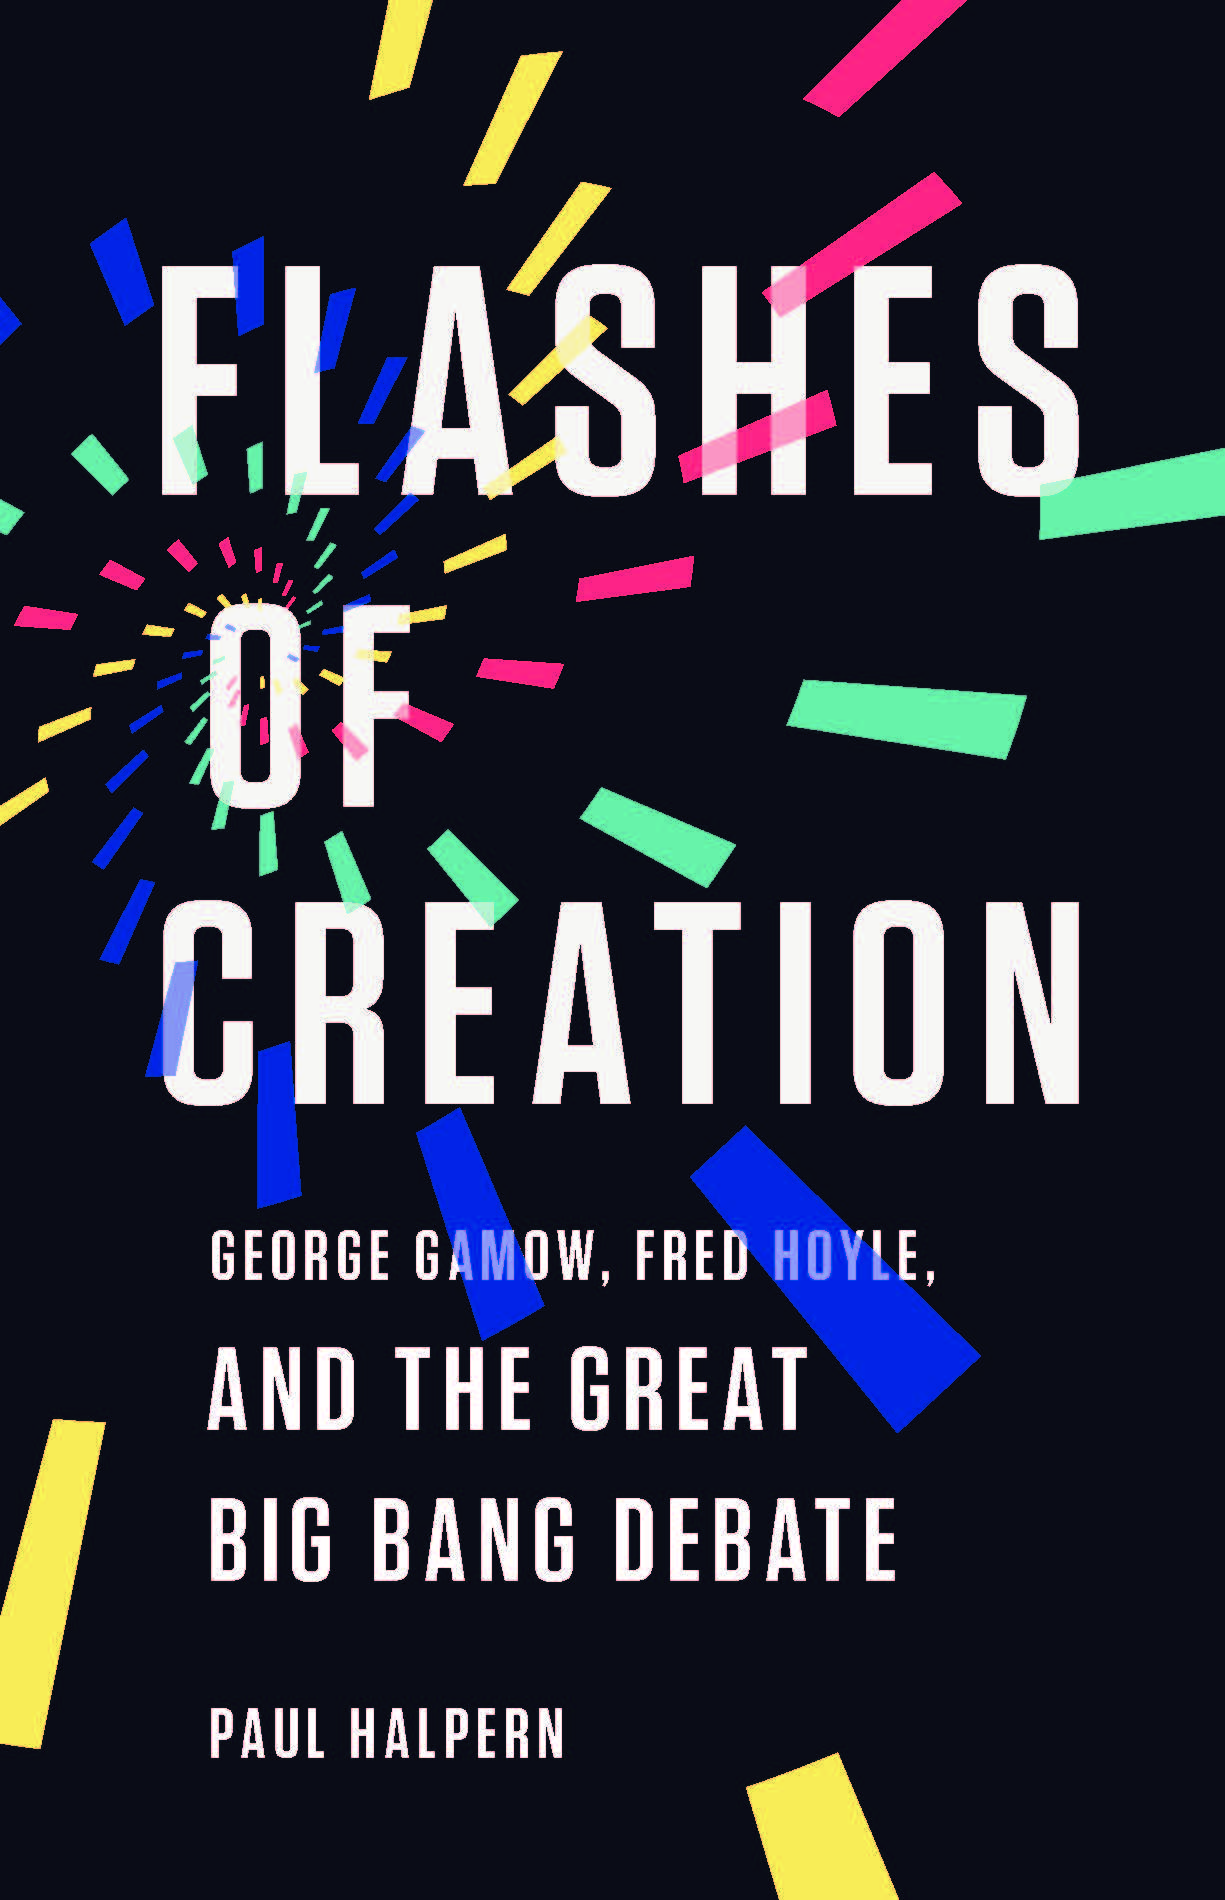 HALPERN_Flashes of Creation